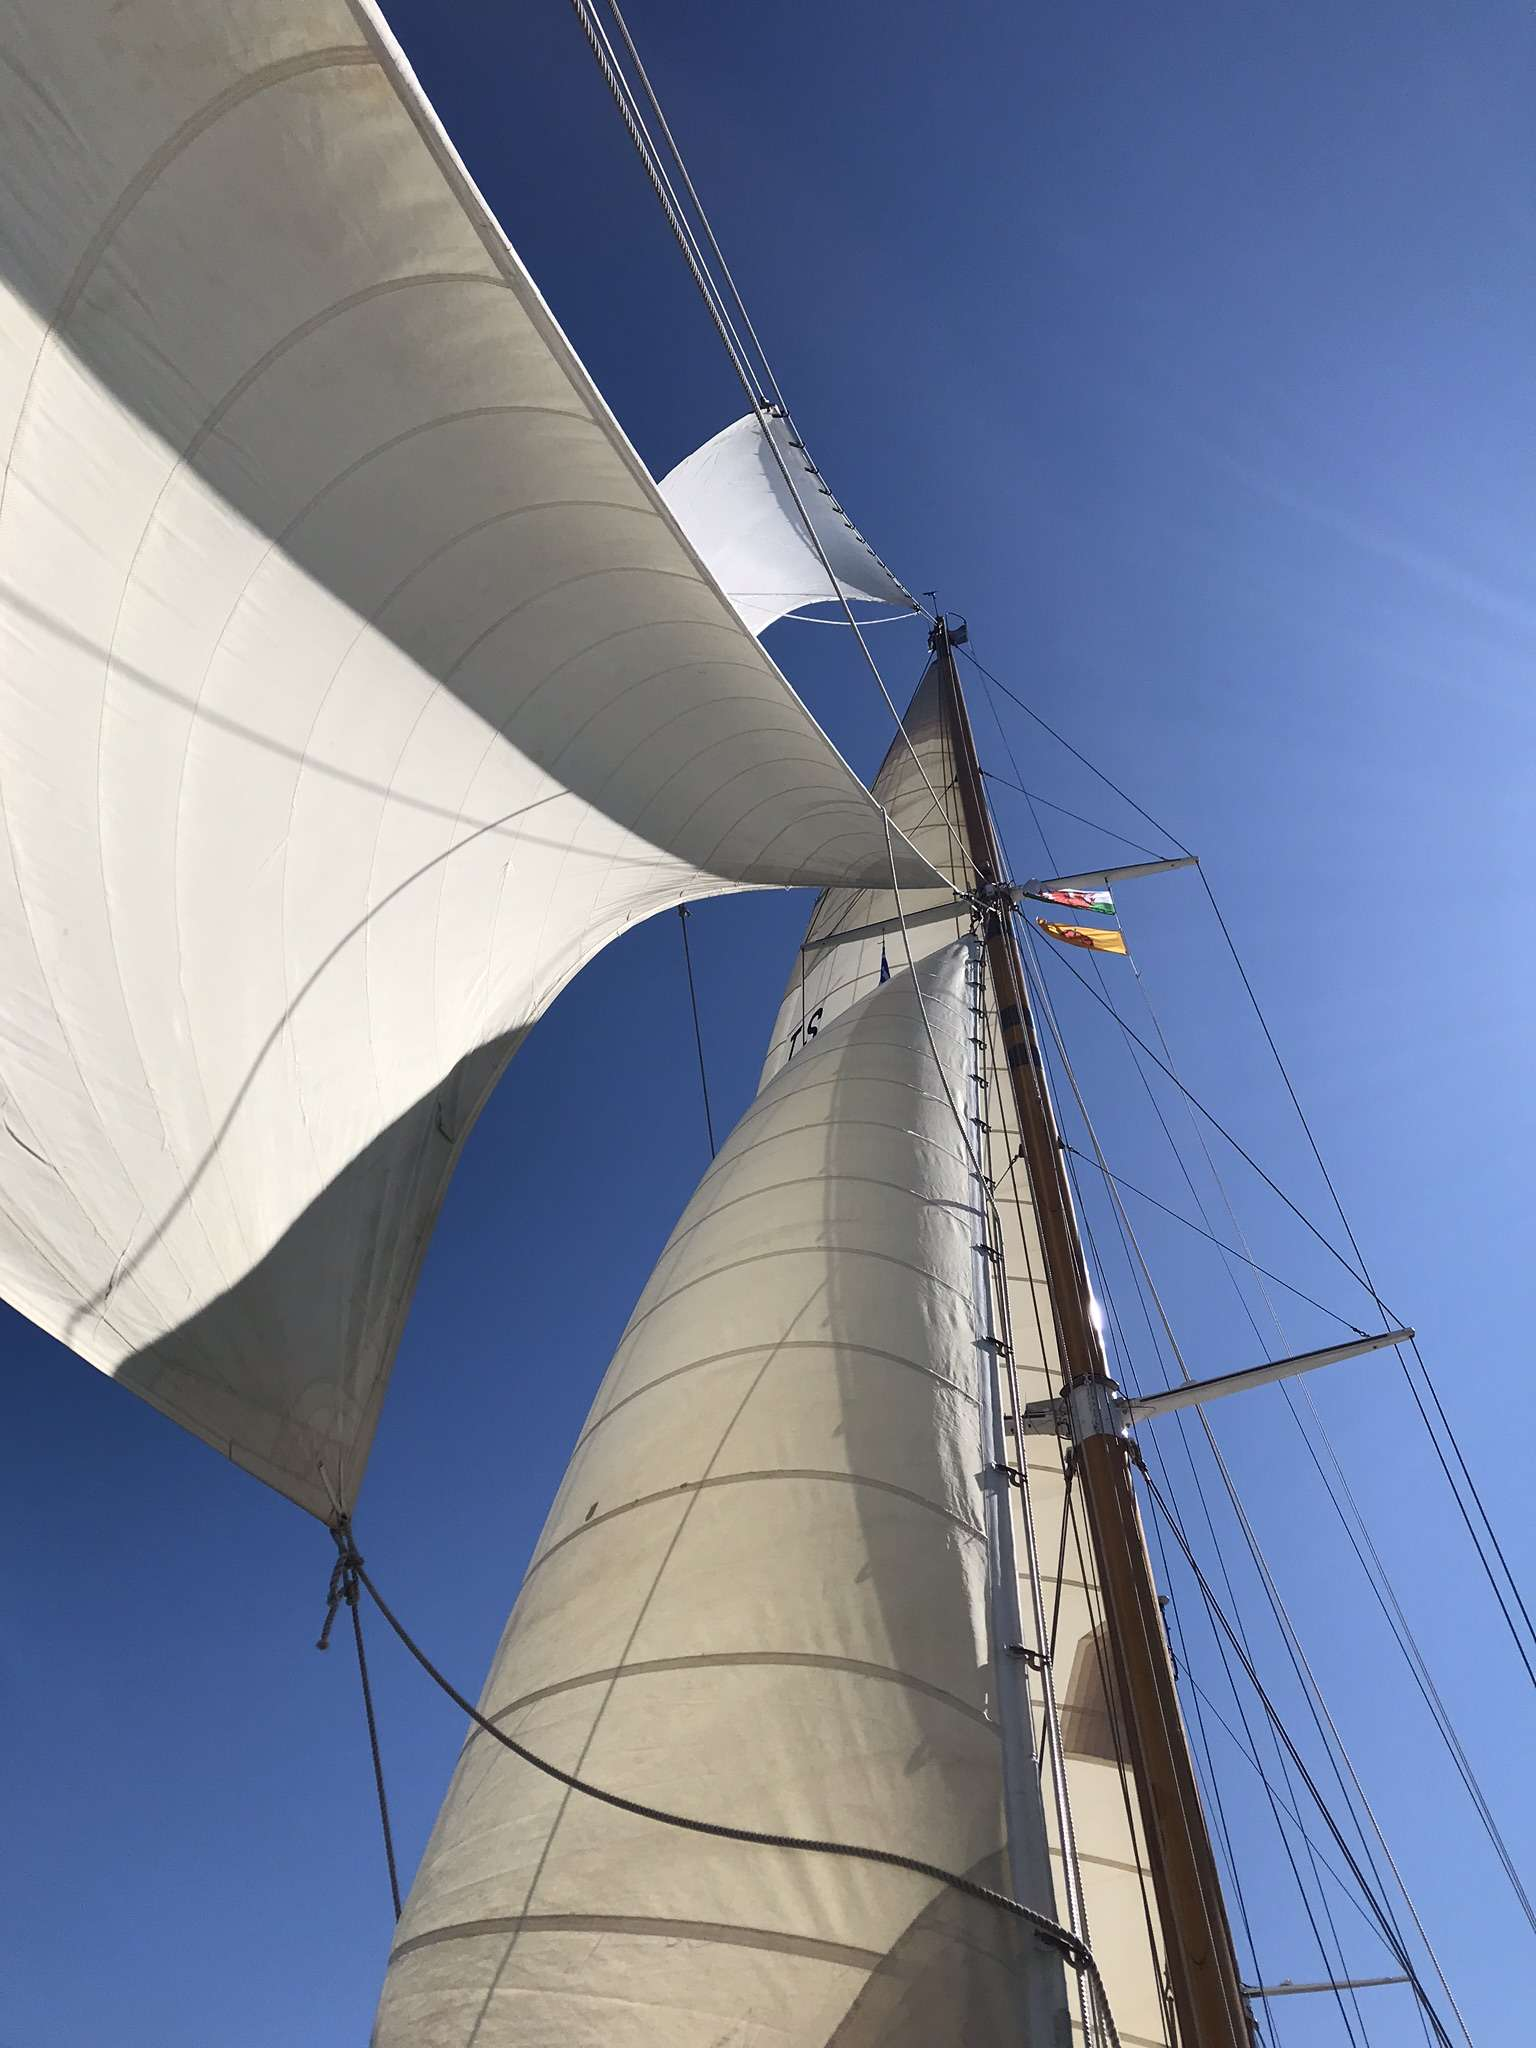 Image of Halcyon yacht #14